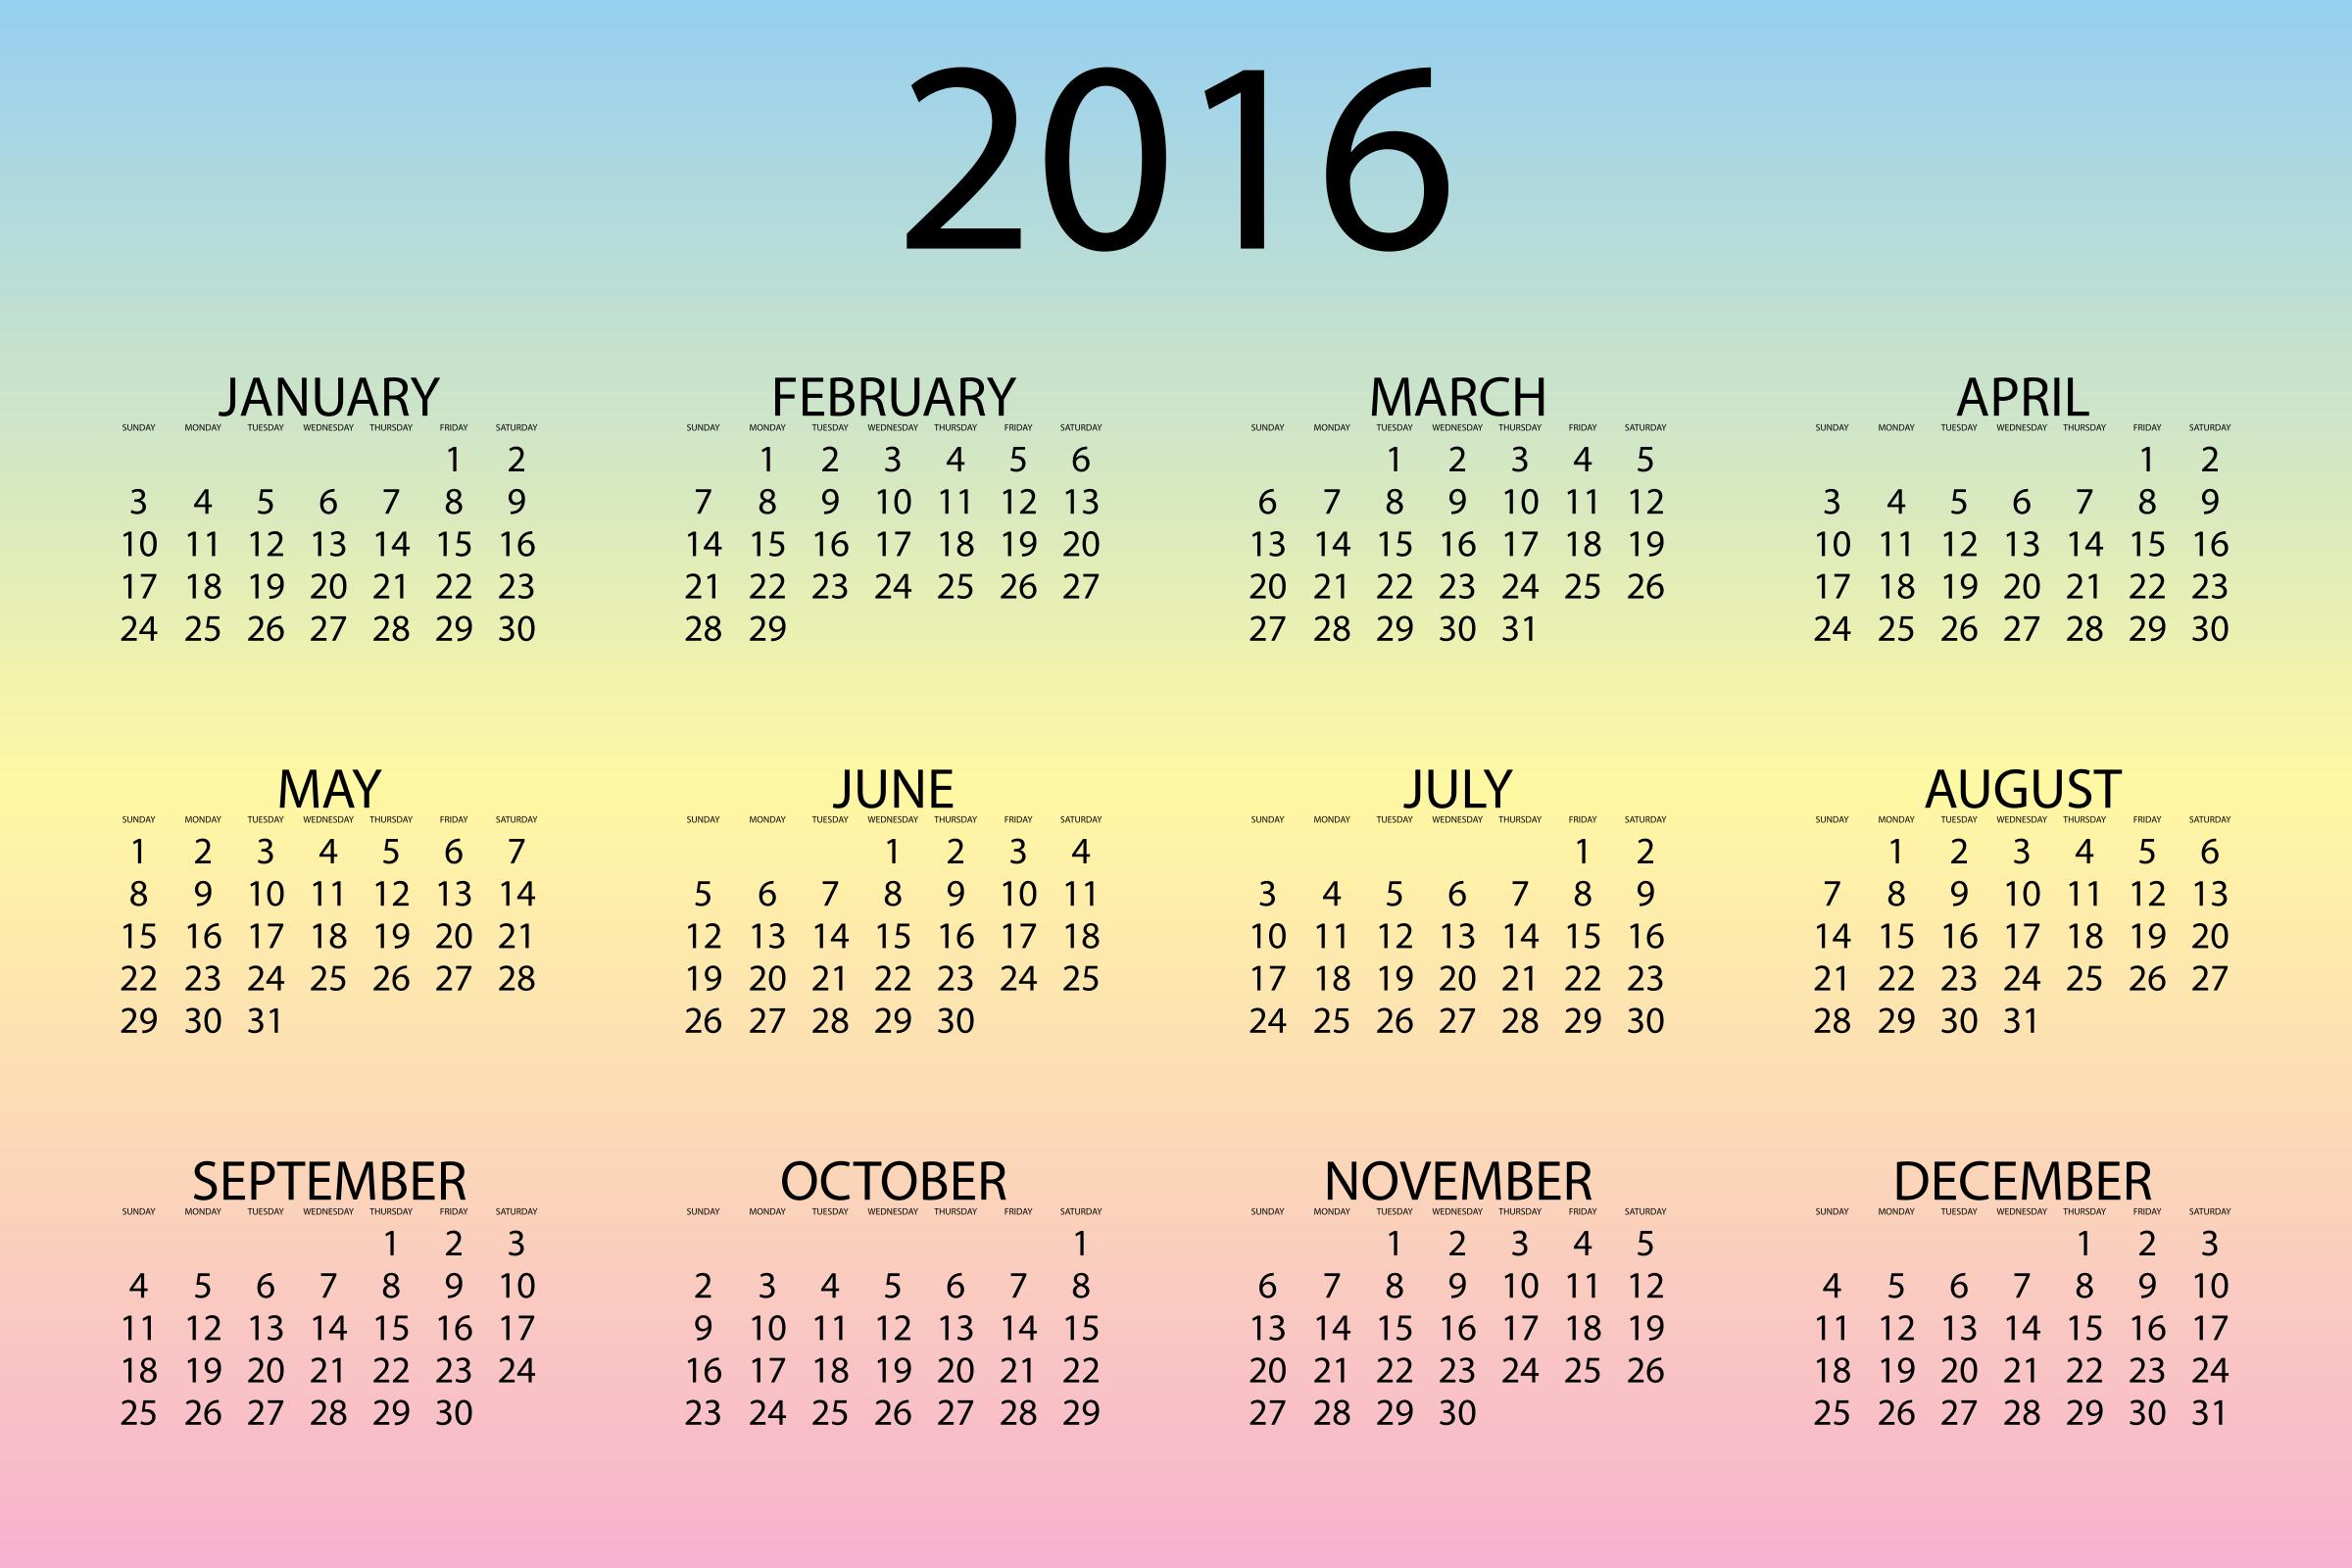 2016 Calendar   Wallpapers Pictures Pics Photos Images Desktop 2400x1600